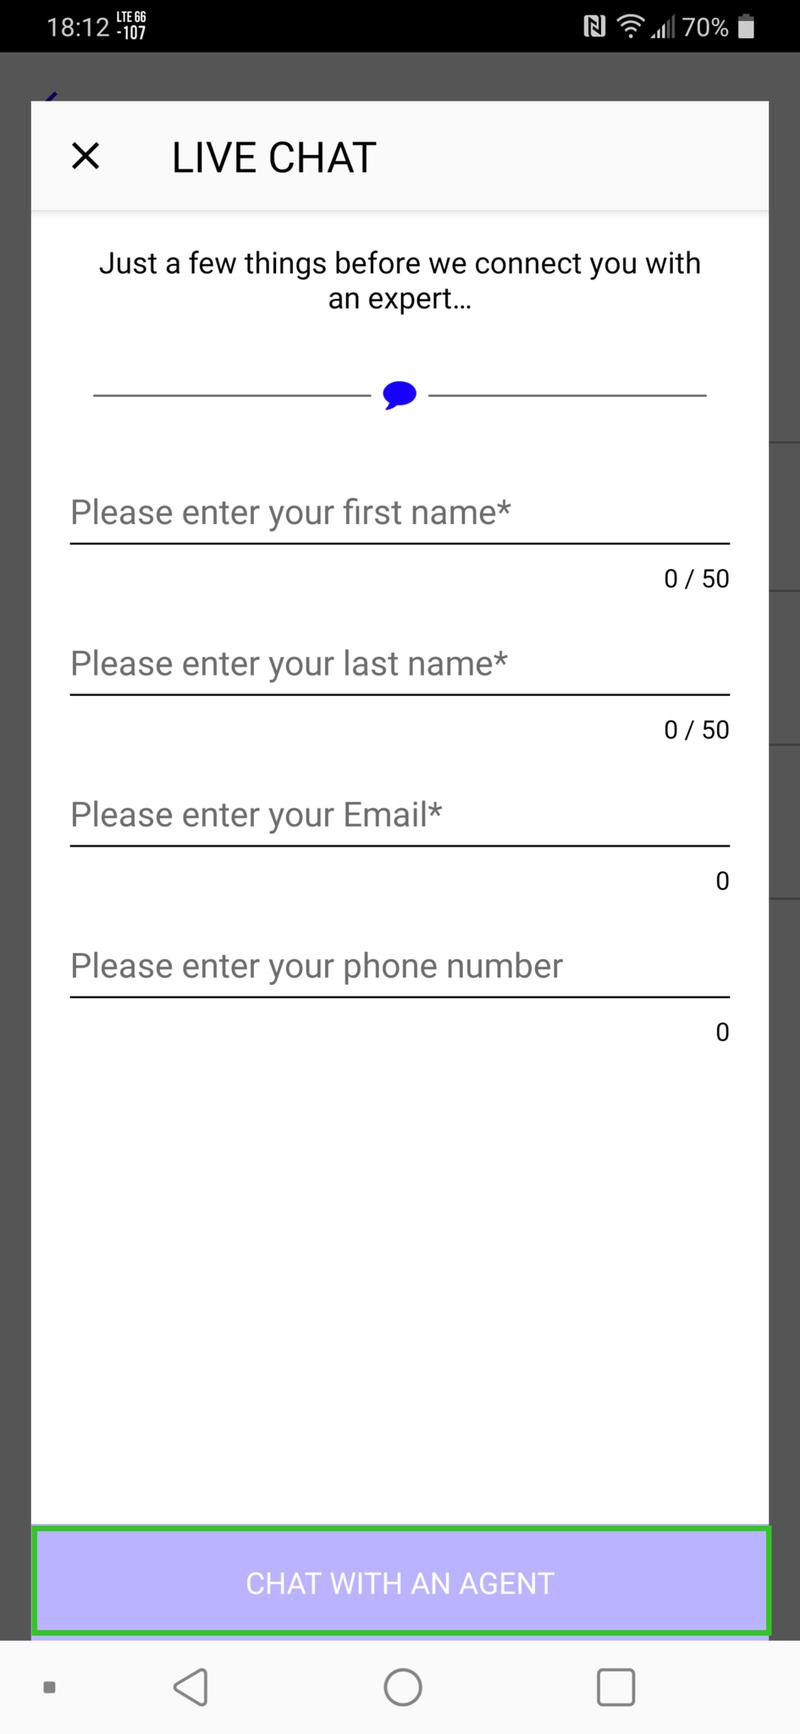 visible-app-contact-3.png?itok=hy-uIKhm